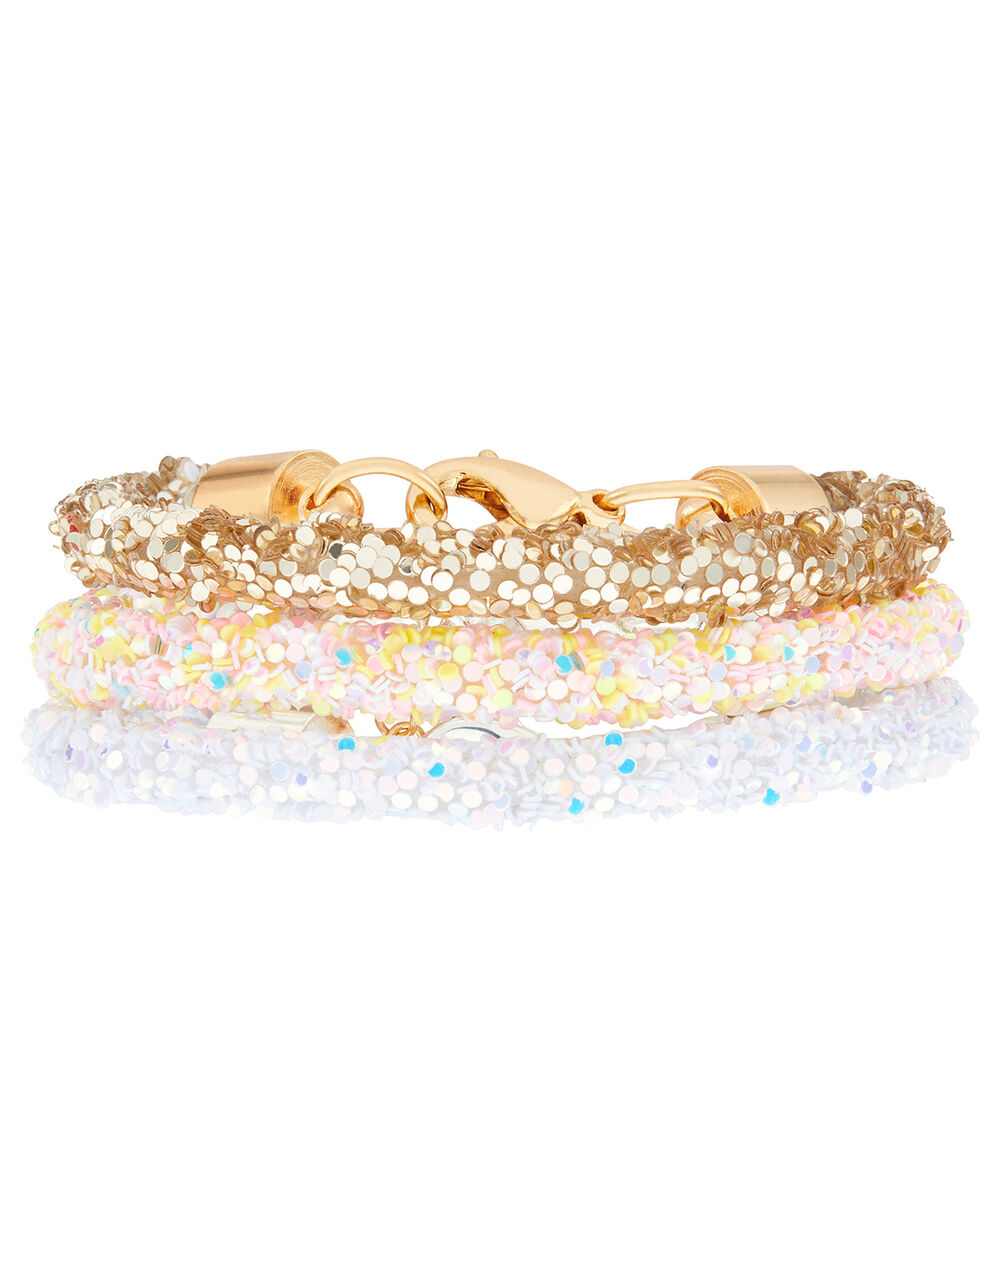 Rainbow Glitter Bracelet Set, , large